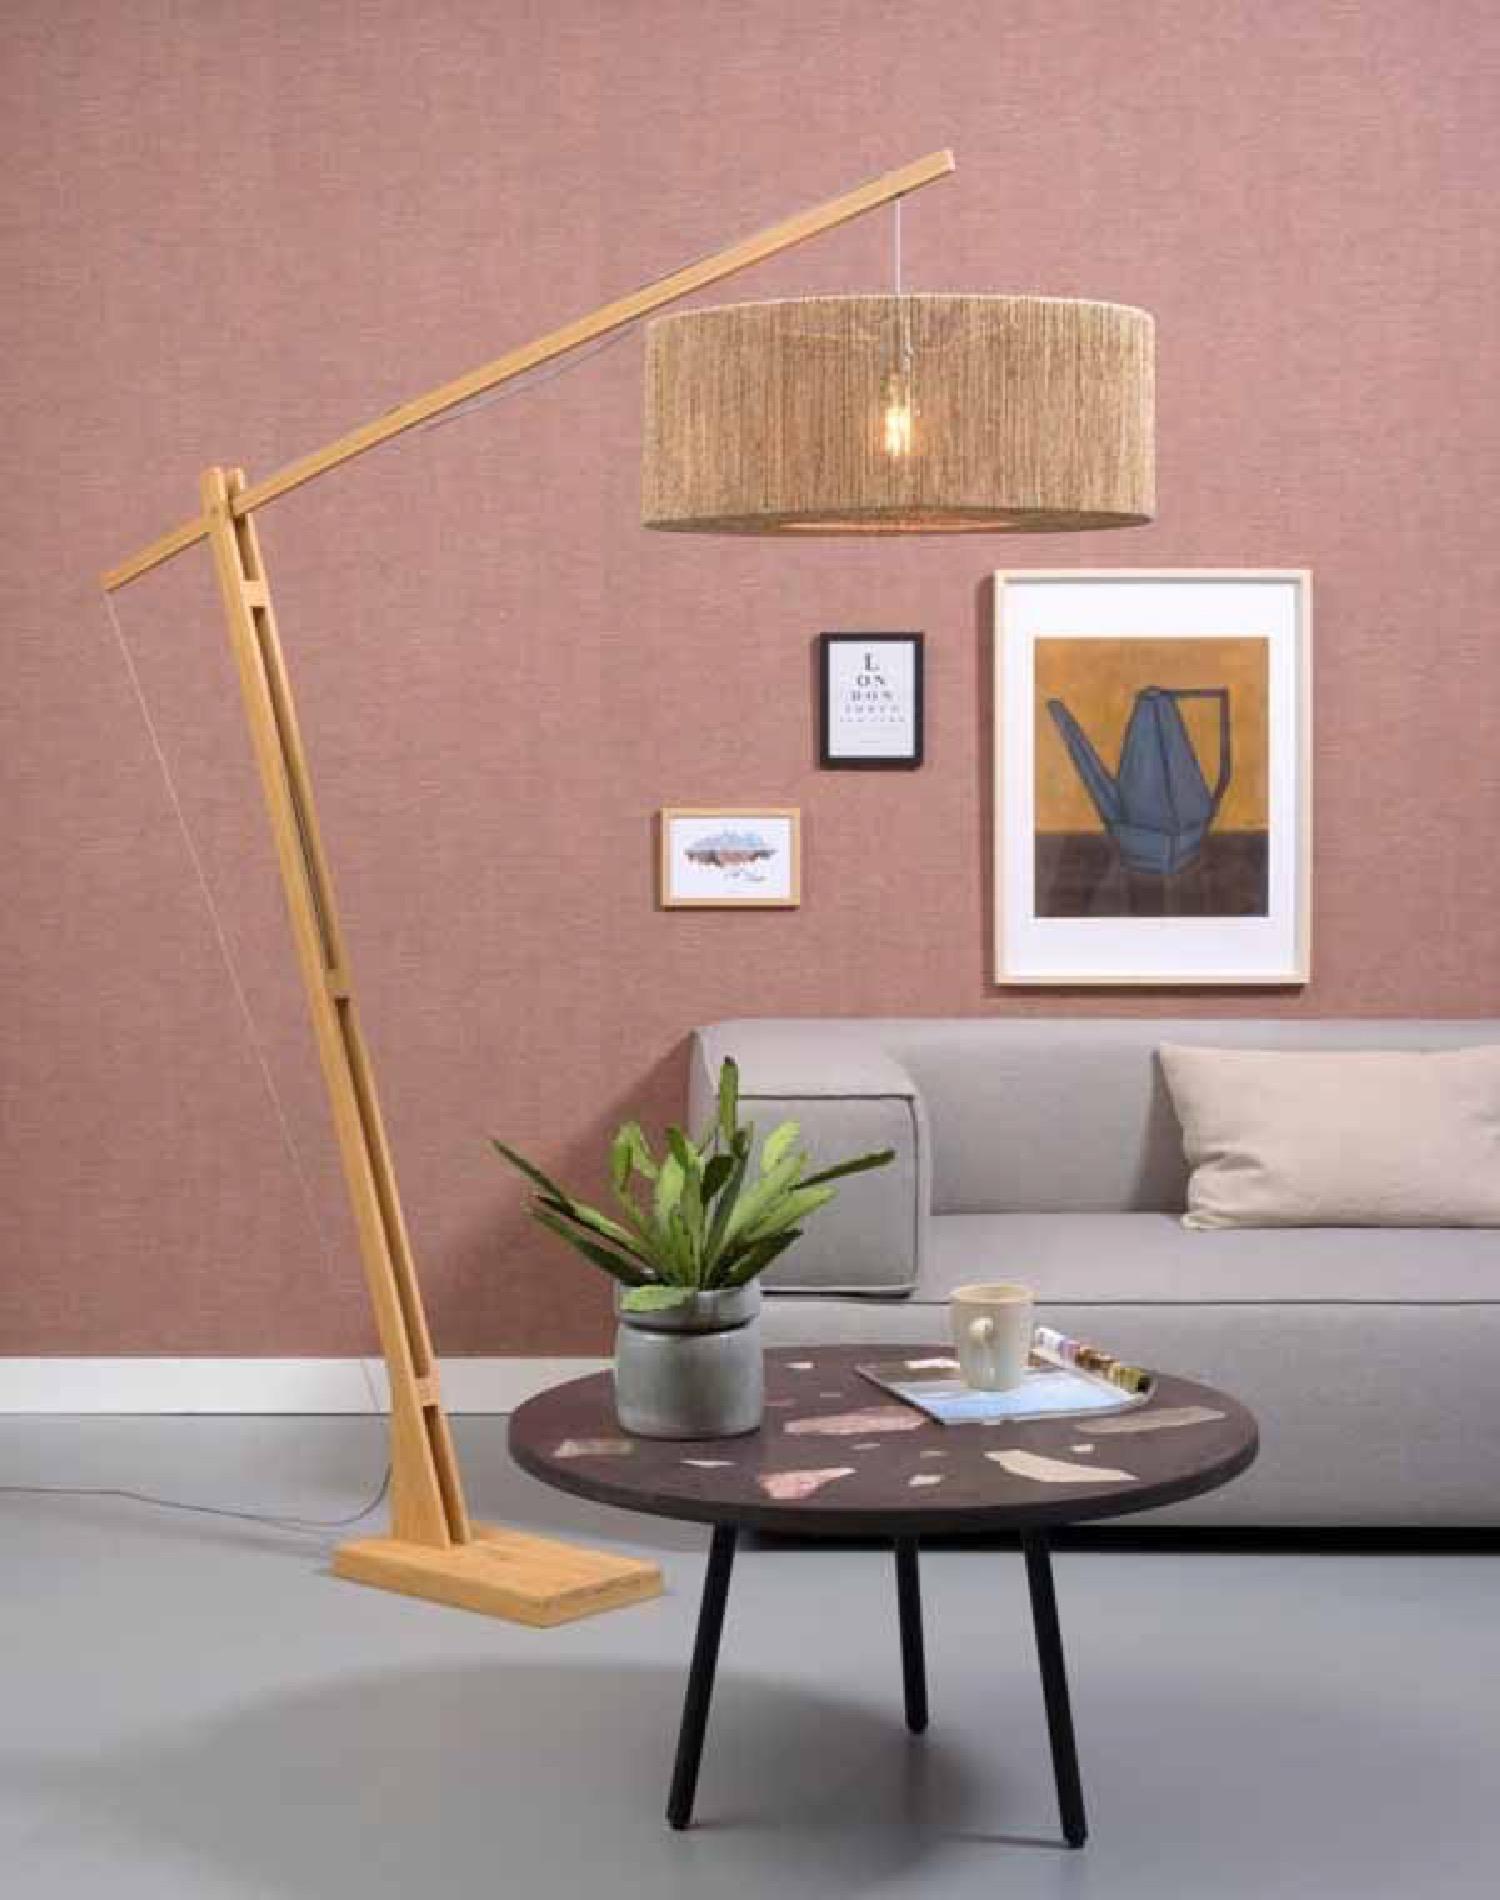 Lampadaire bambou/jute H207cm